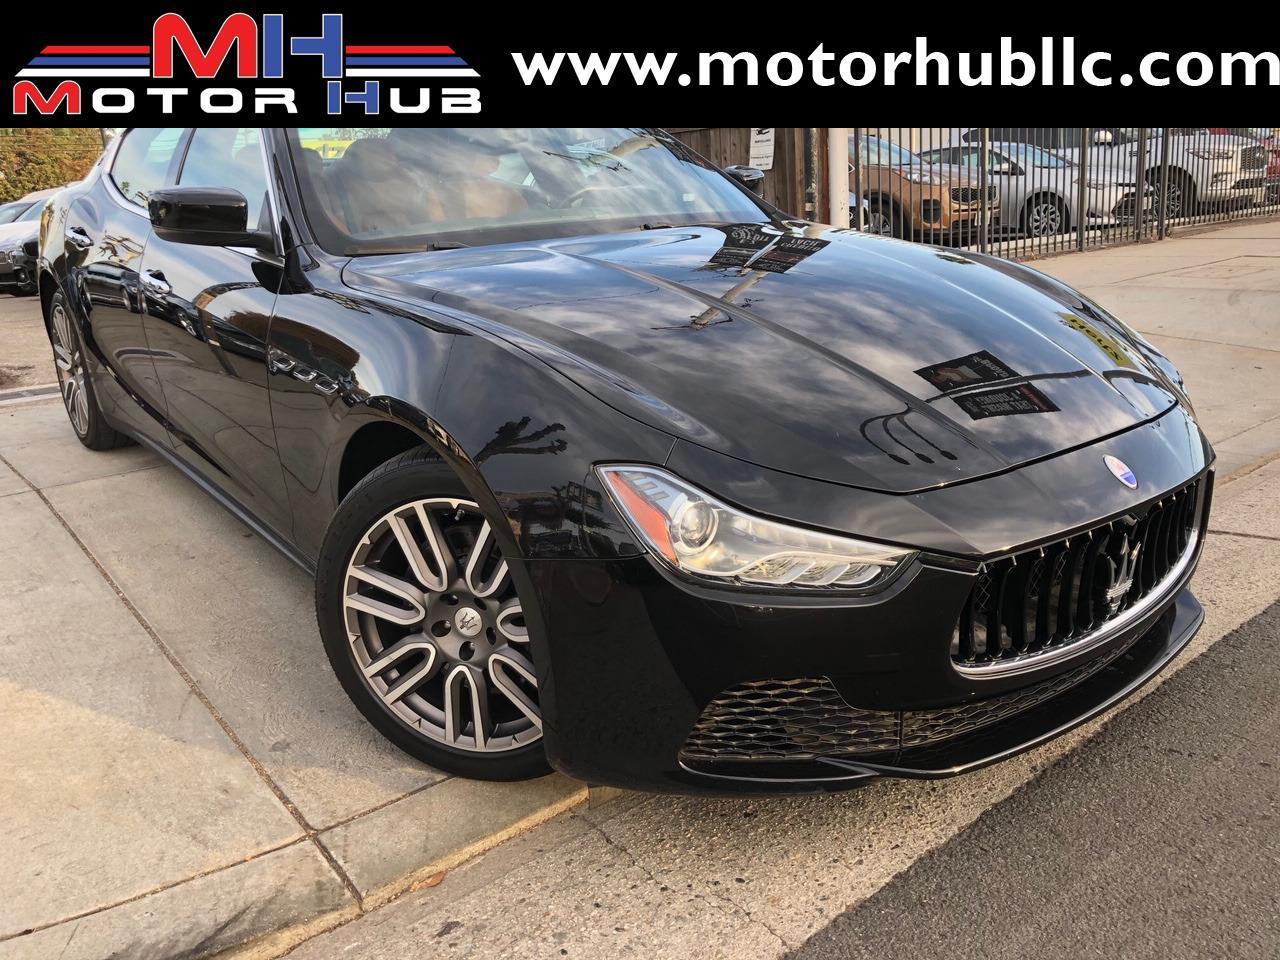 2015 Maserati Ghibli Stock 162144 For Sale Near Van Nuys Ca Ca